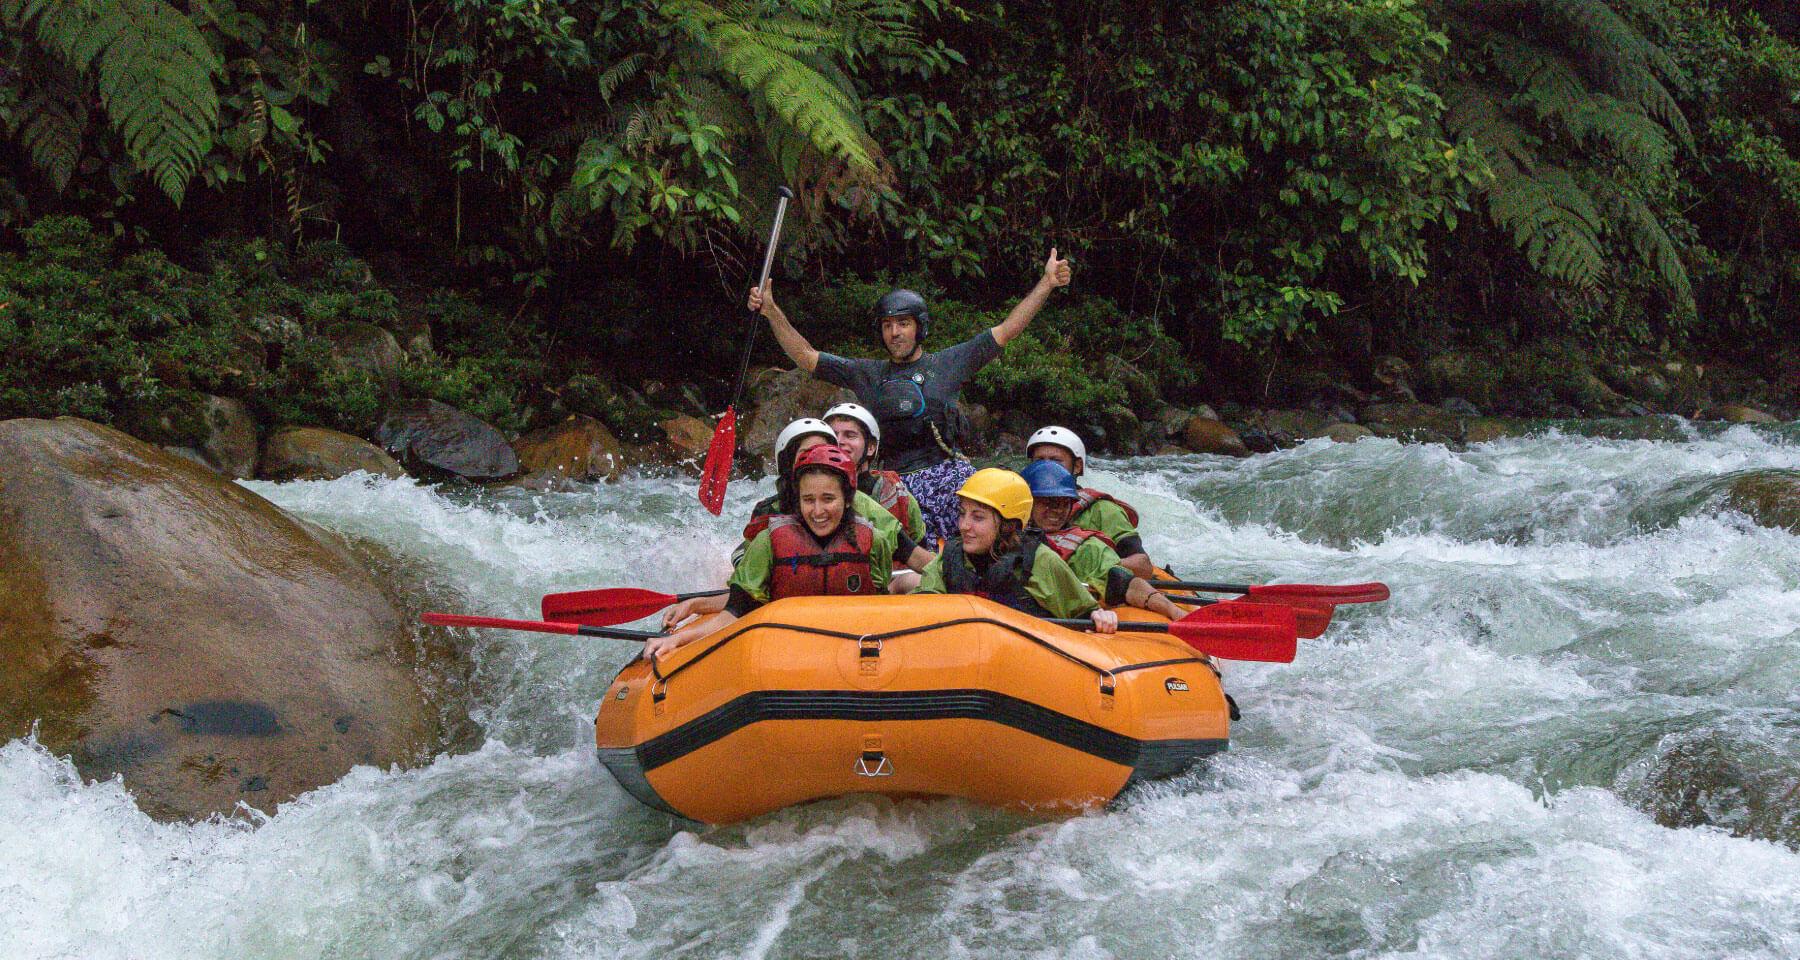 Descending rivers in raft boat in Ecuador